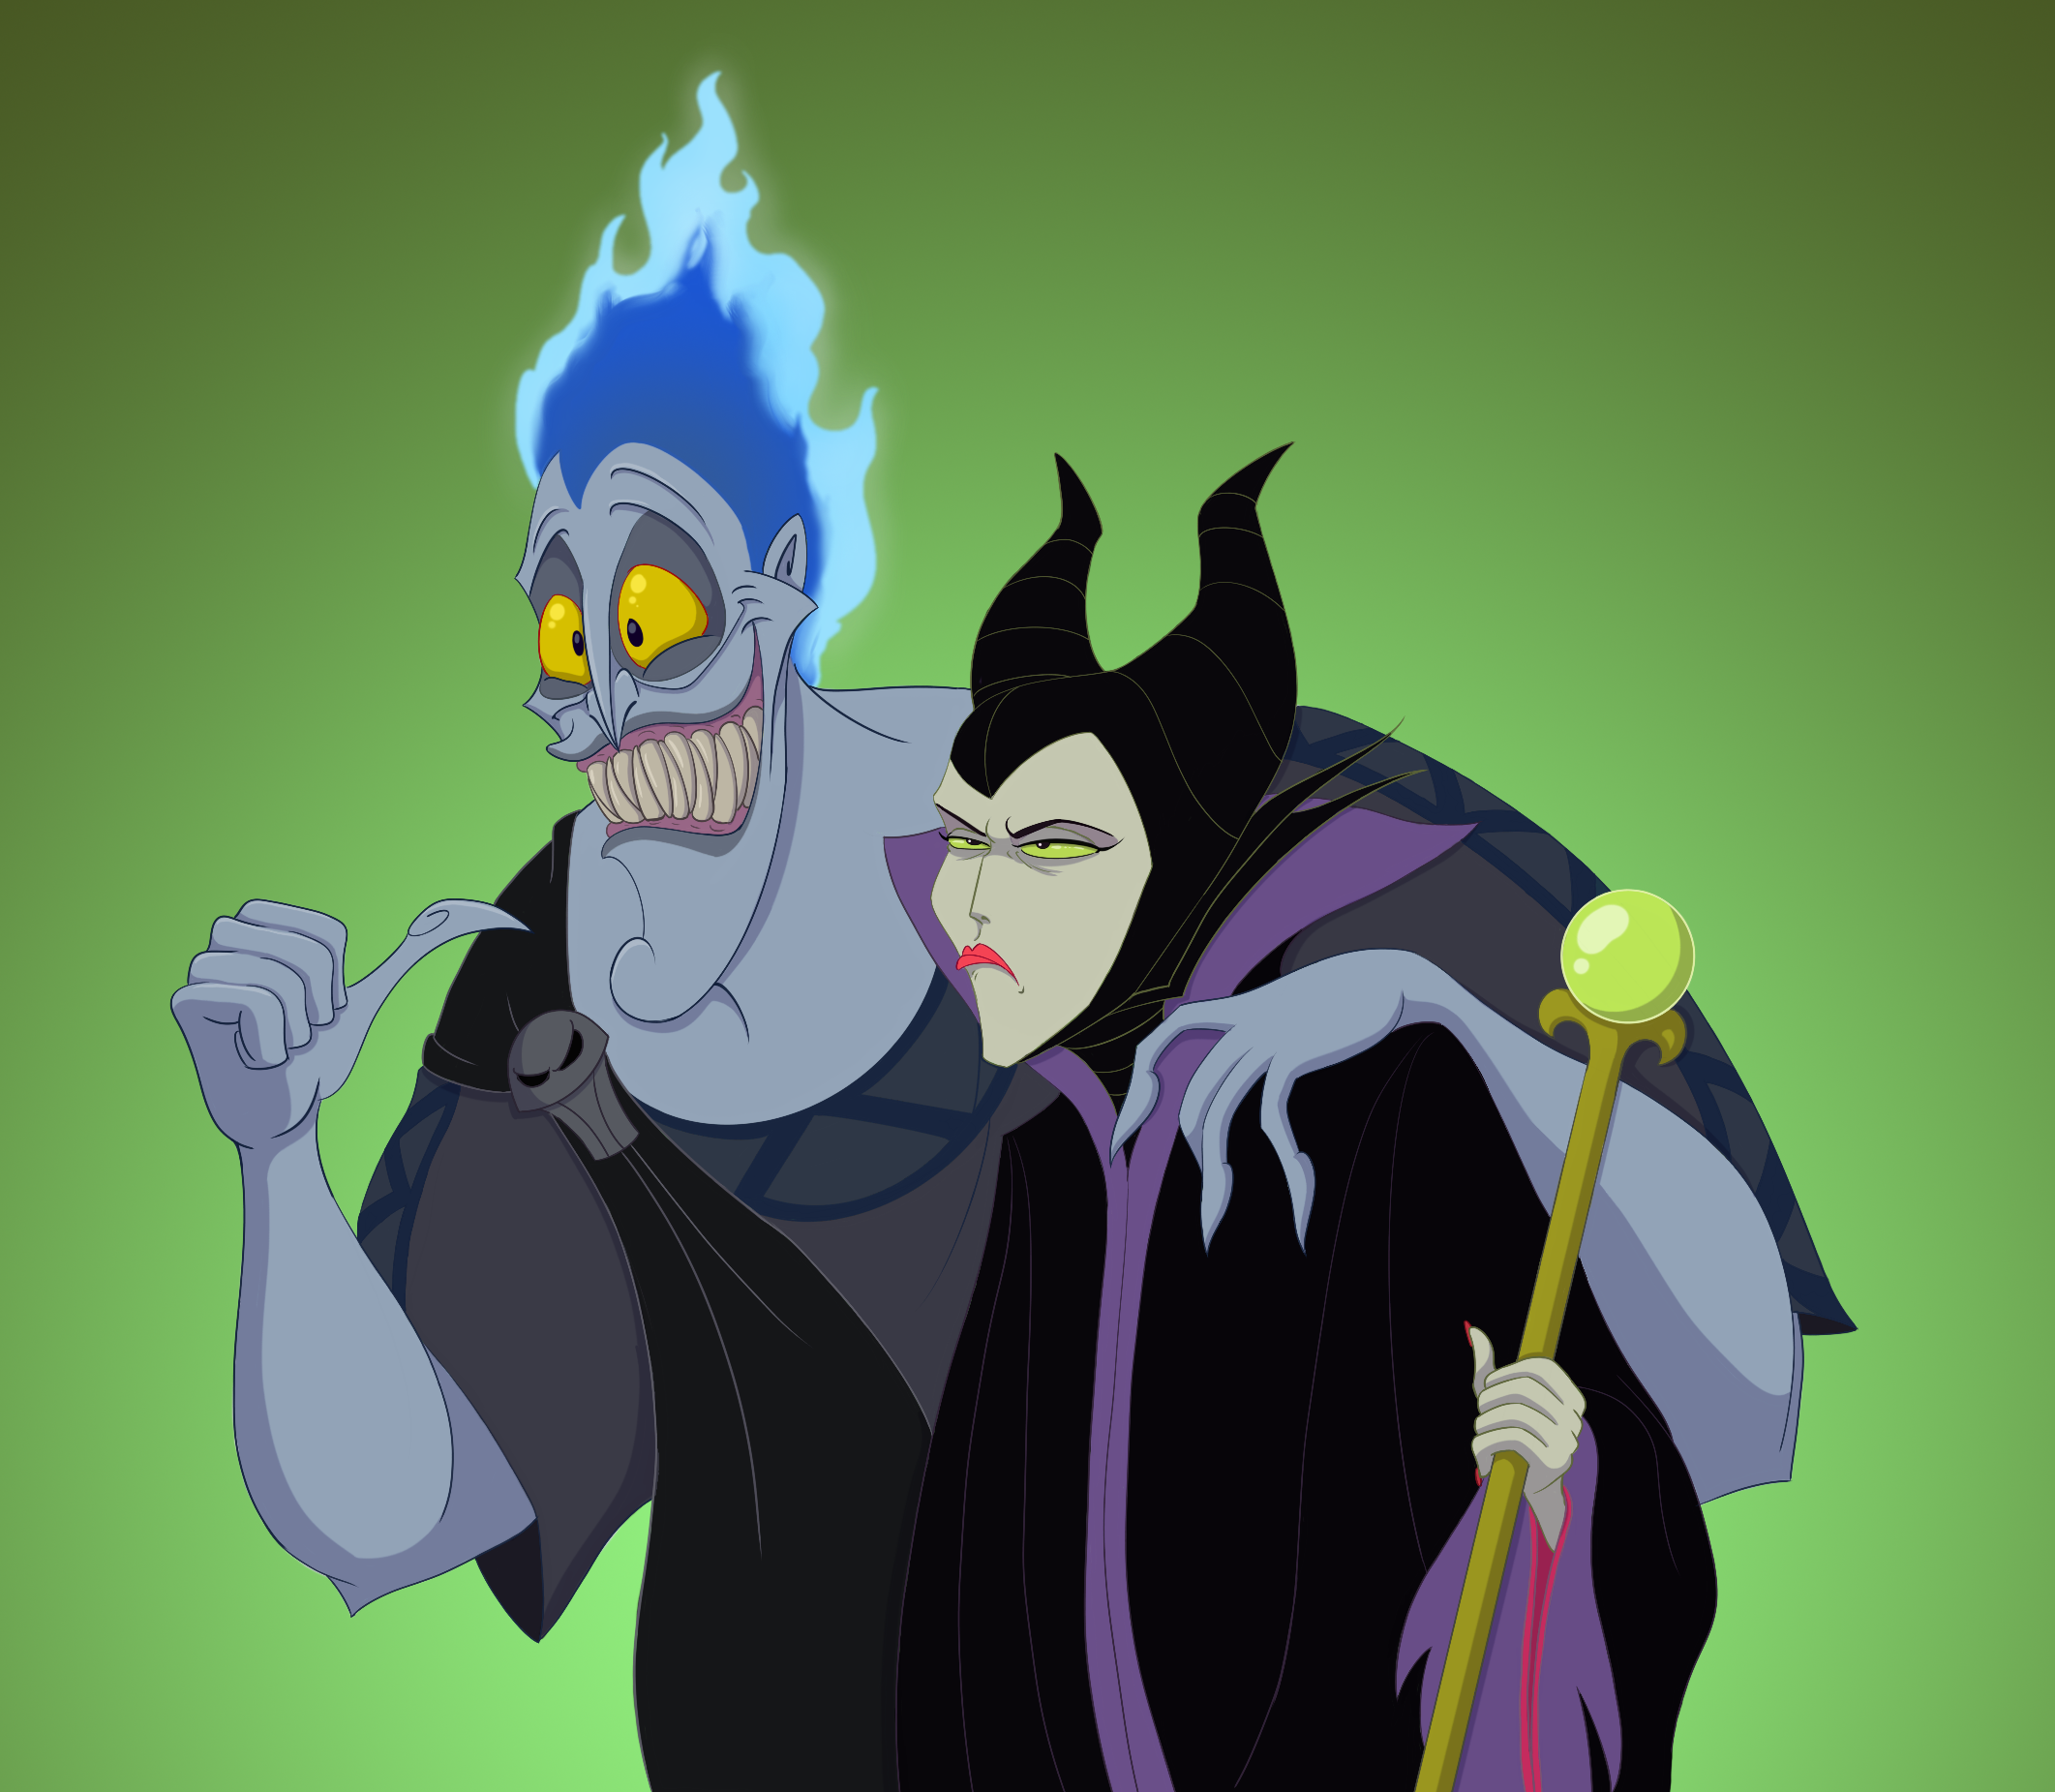 The Evil Power Couple